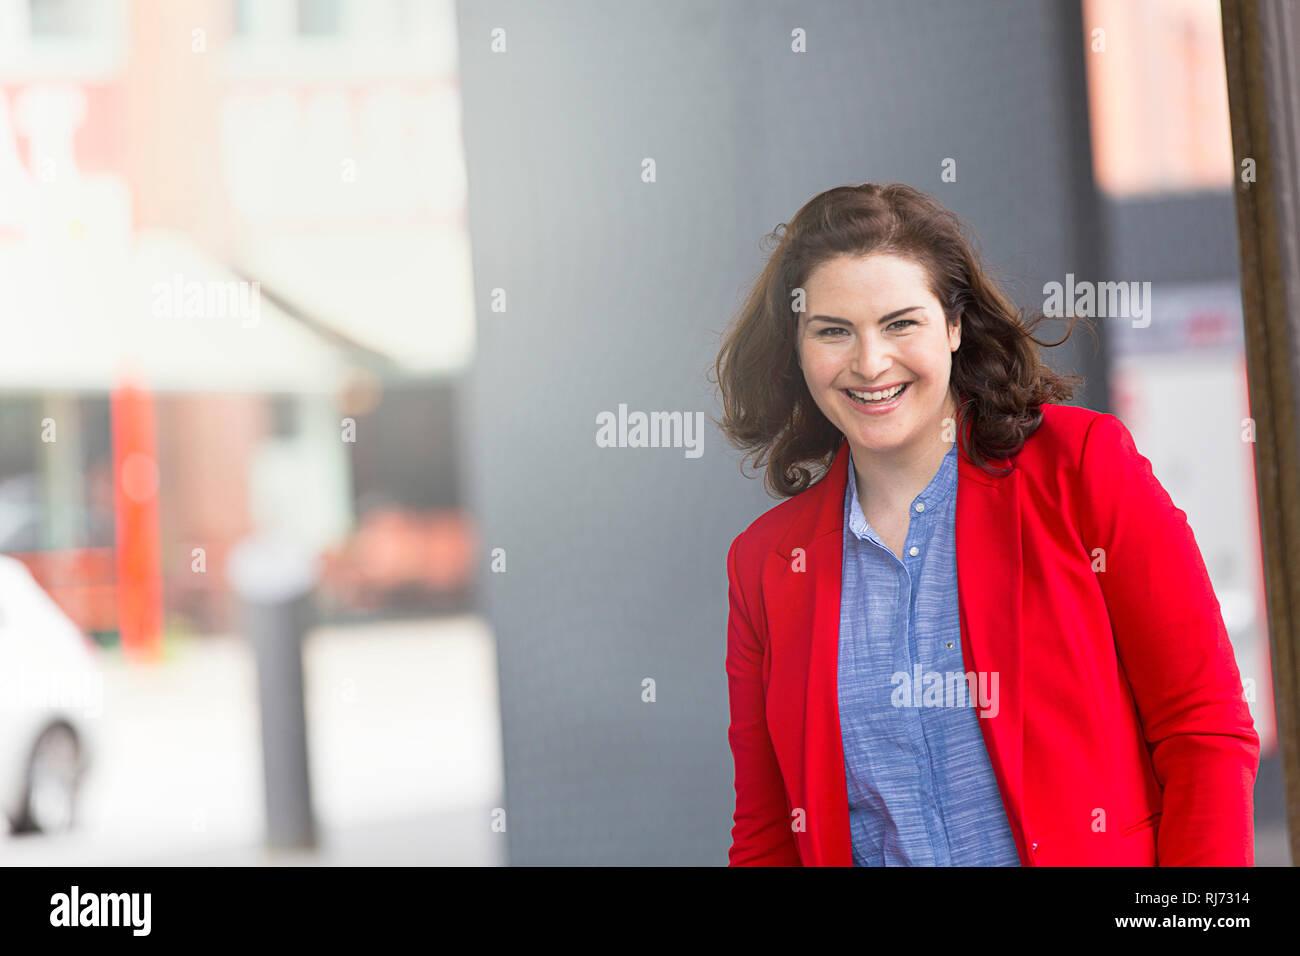 Frau, lächeln, Porträt, - Stock Image